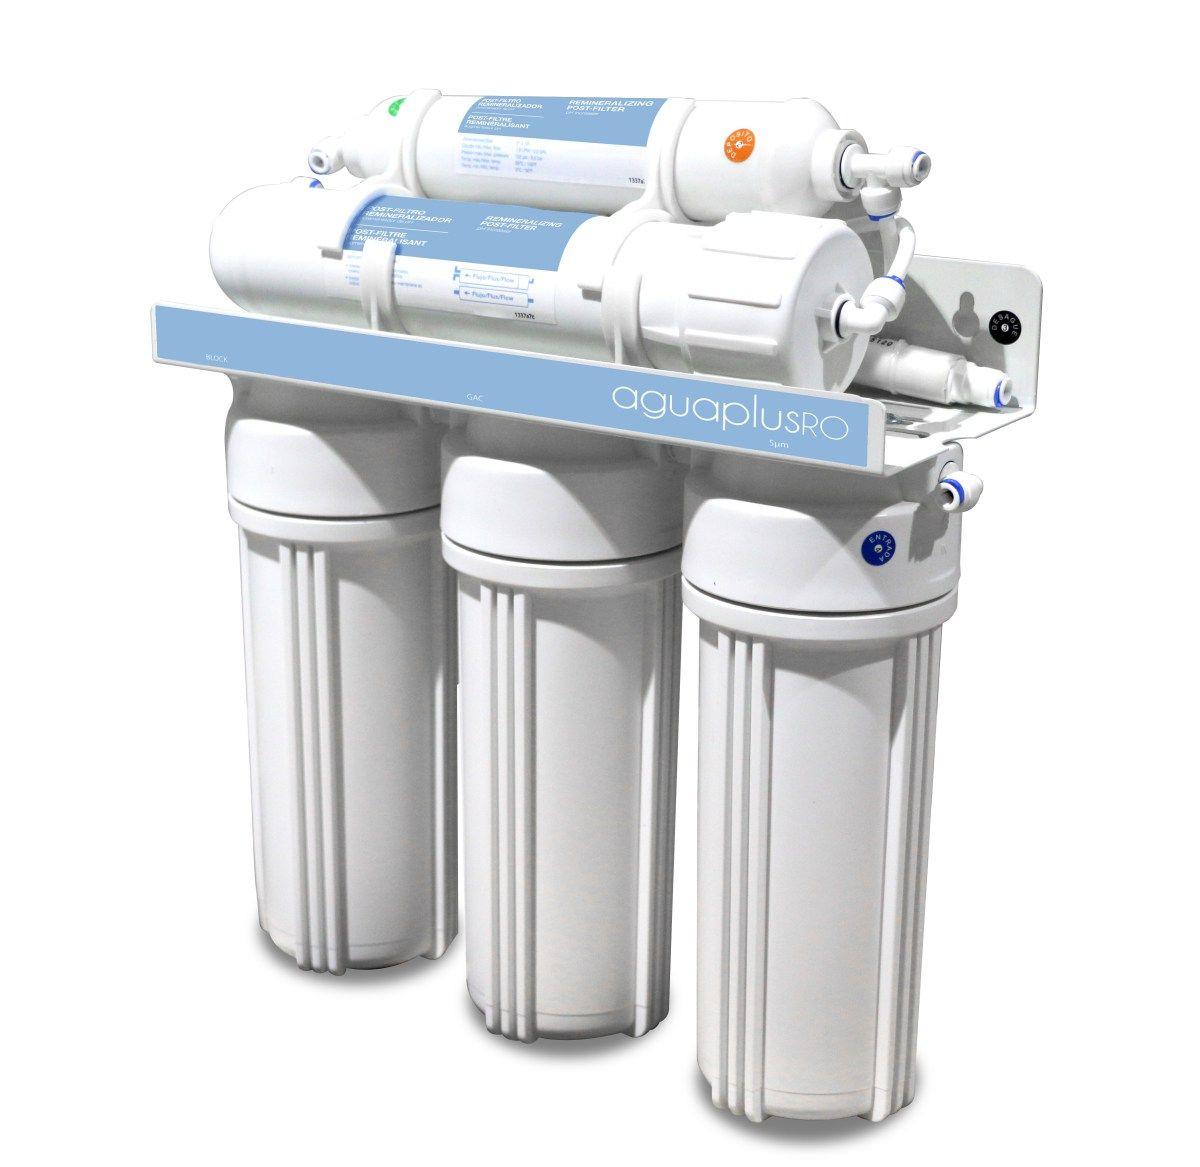 Osmosis Aguaplus El Nuevo Equipo De Osmosis Inversa Agua Potable Revestimiento Plastico Agua Pesada